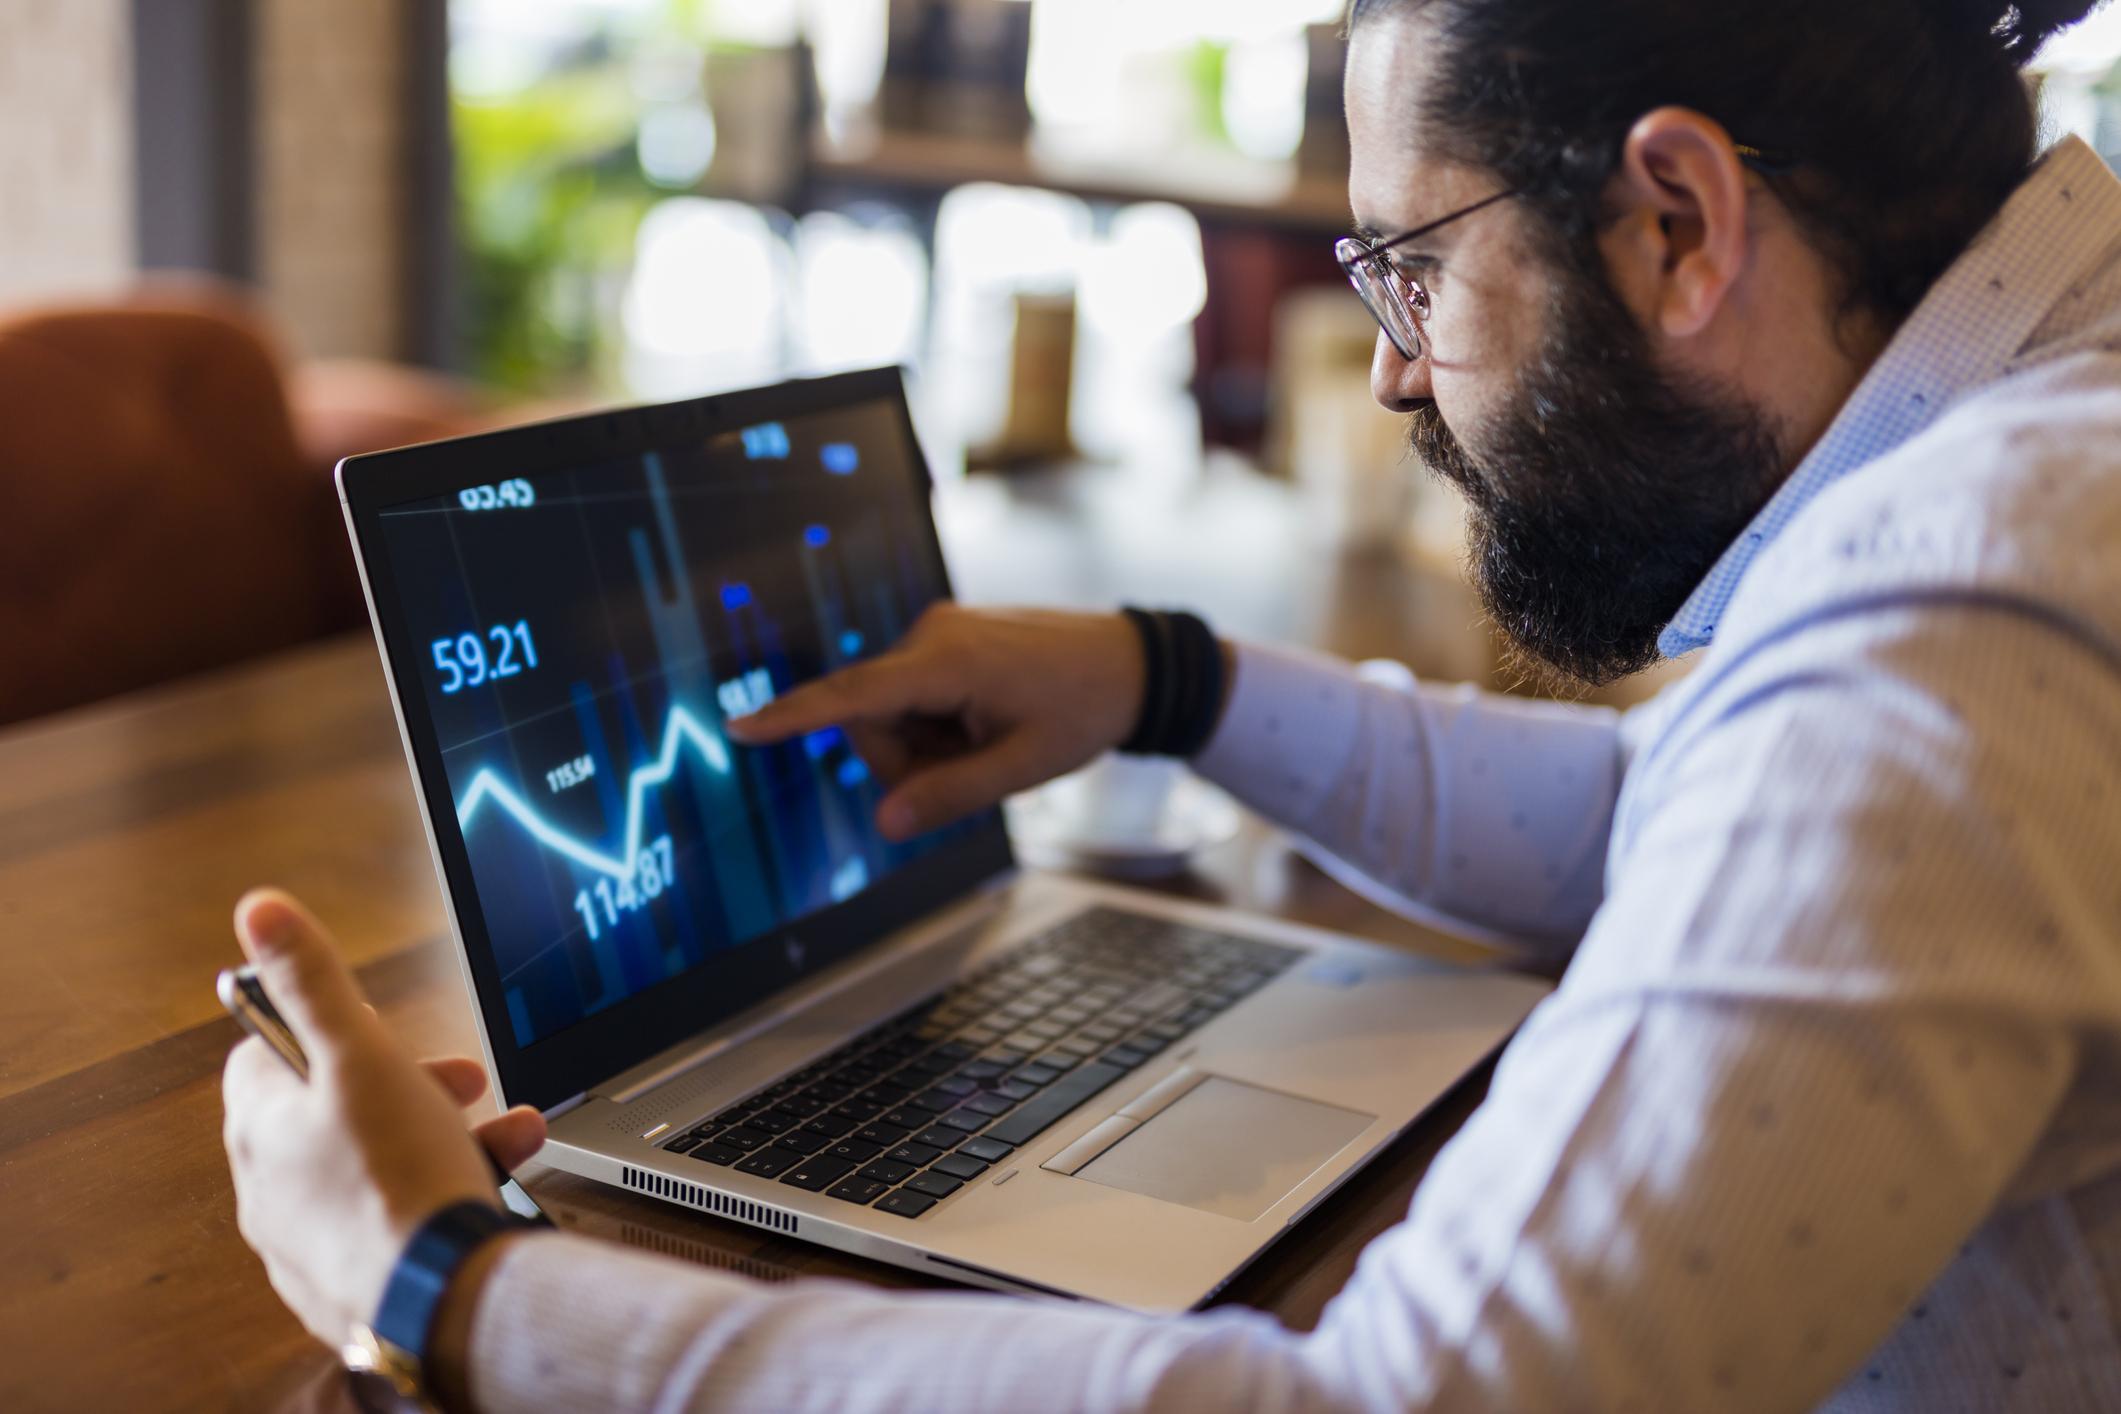 Is Intel Stock Finally Worth Buying? Harsh Chauhan | Jul 29, 2021